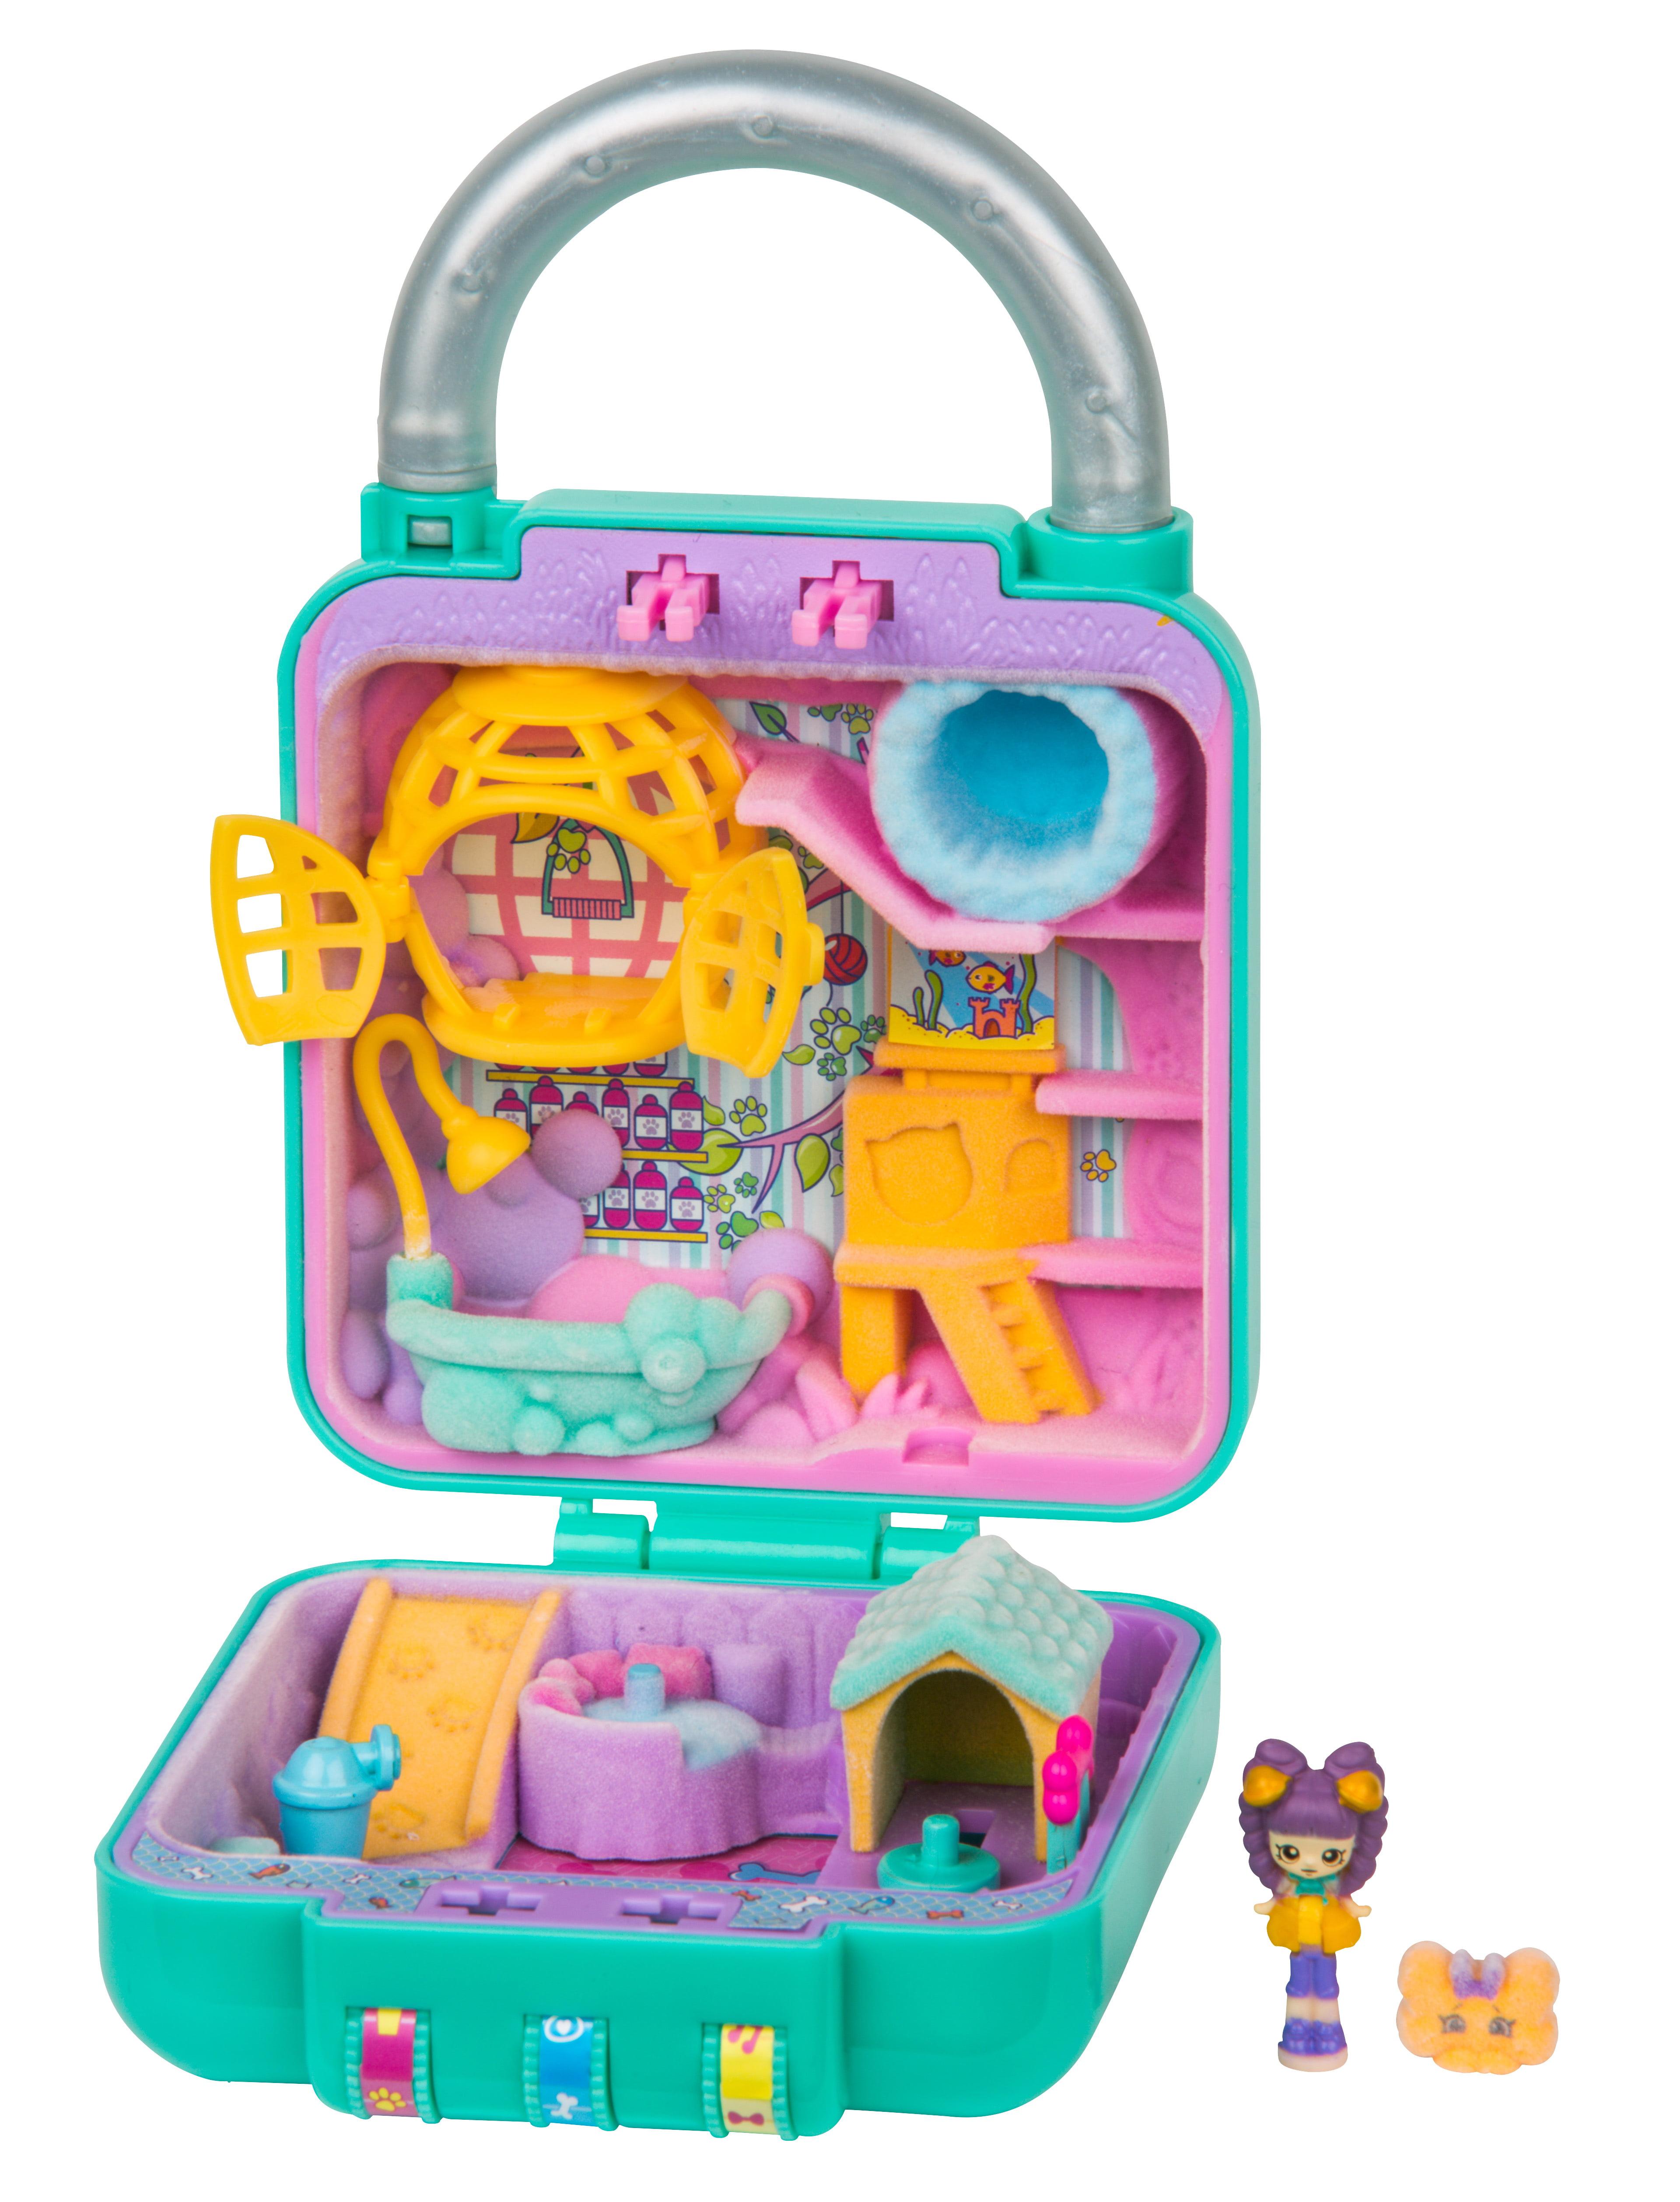 94a8a1bf1 Shopkins Lil  Secrets Secret Lock Playset